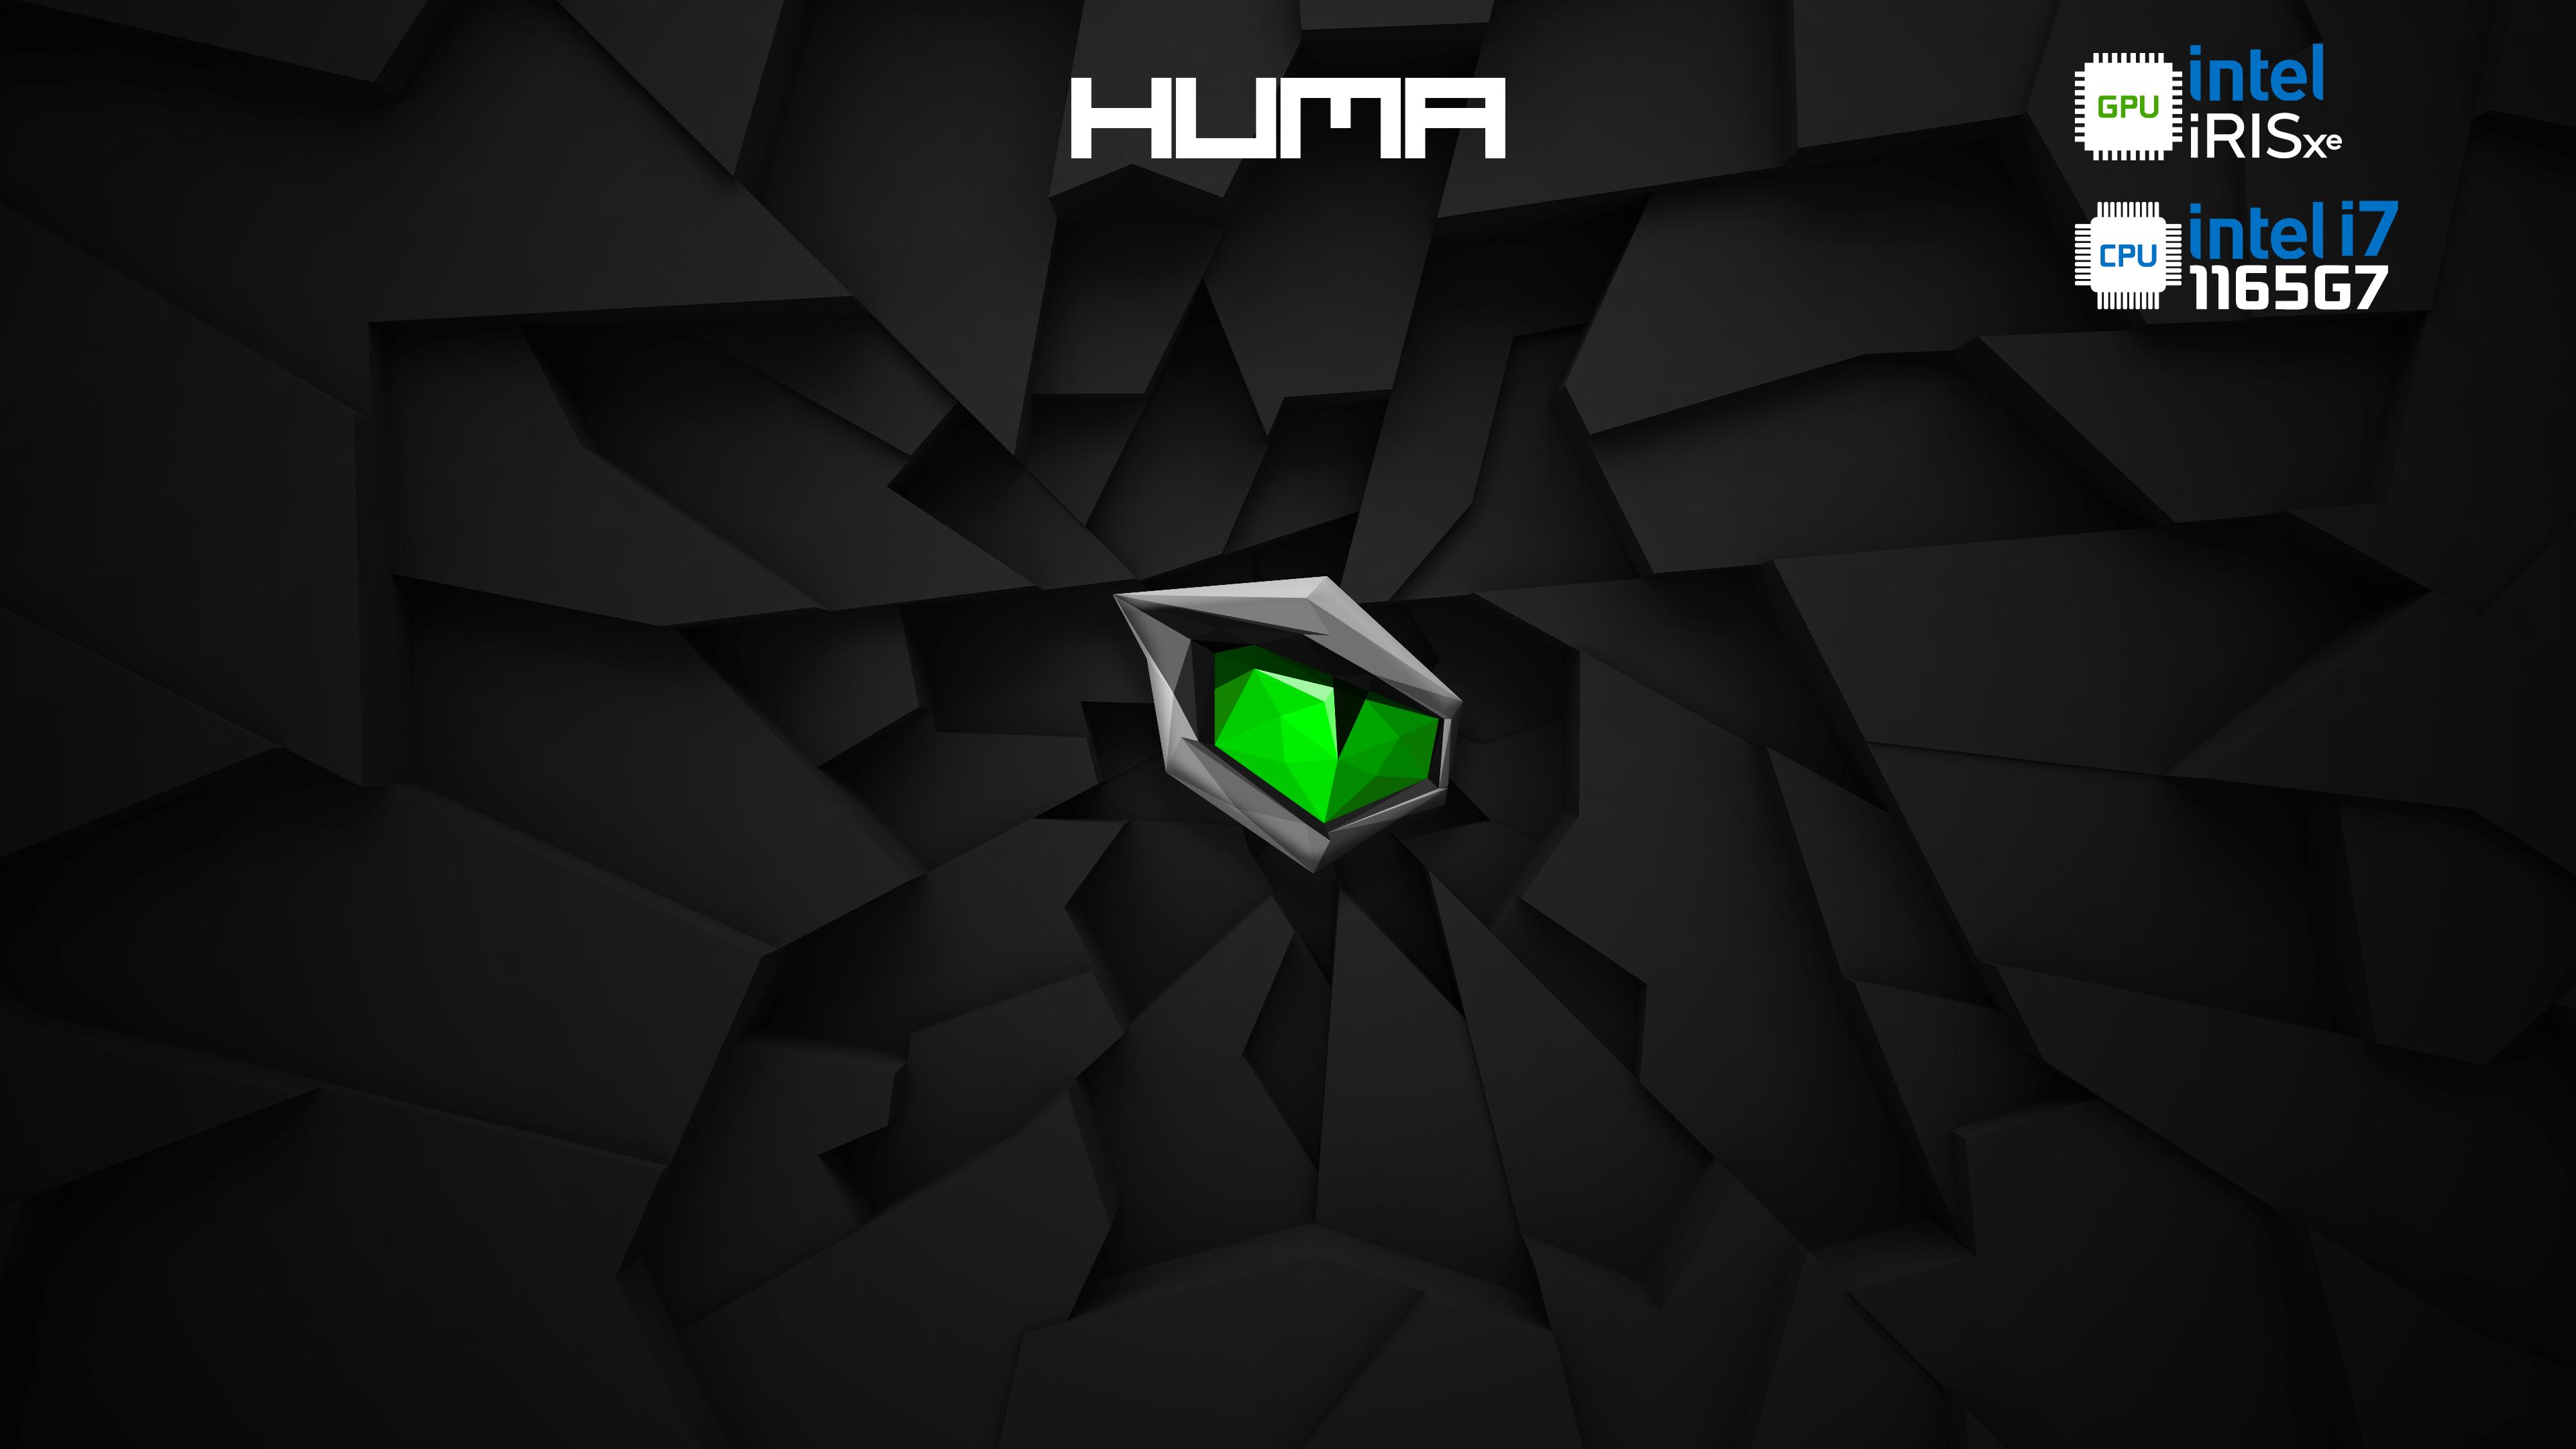 Monster -Huma - Intel Iris - i7 - 1165G7